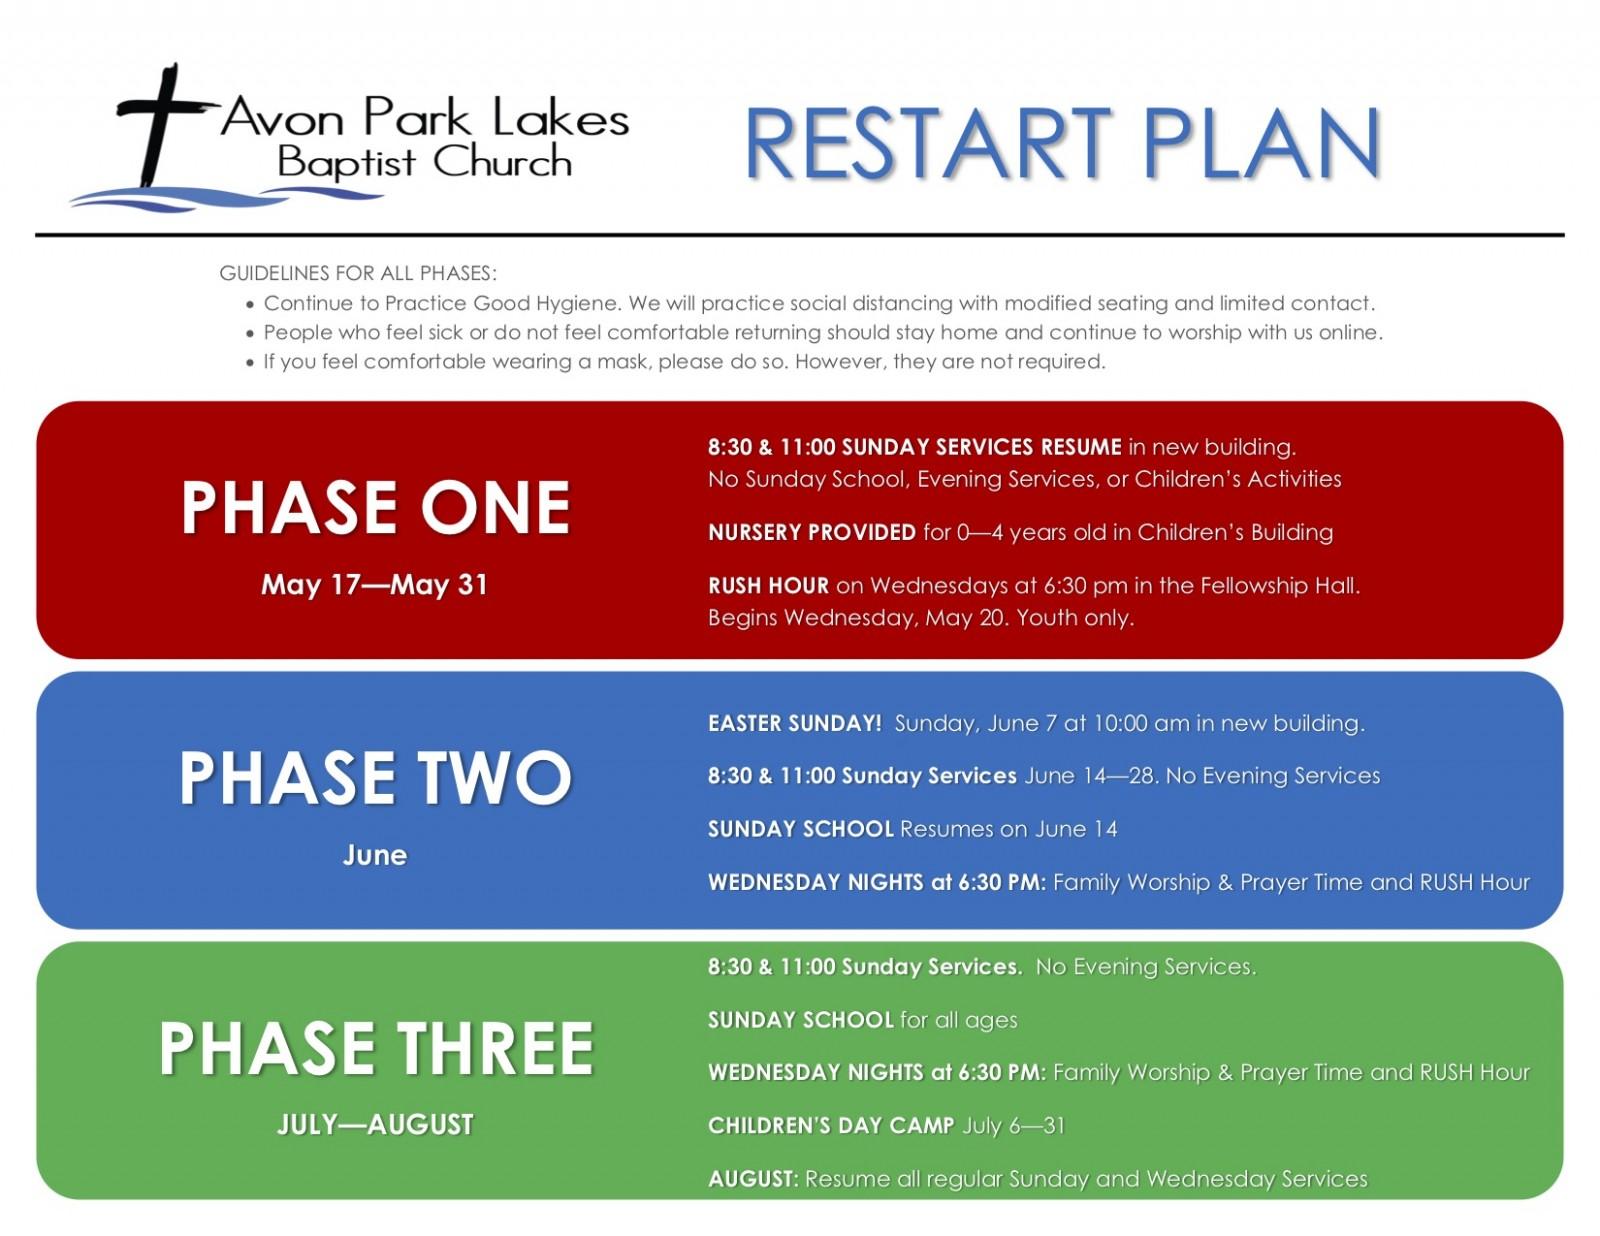 Restart Plan